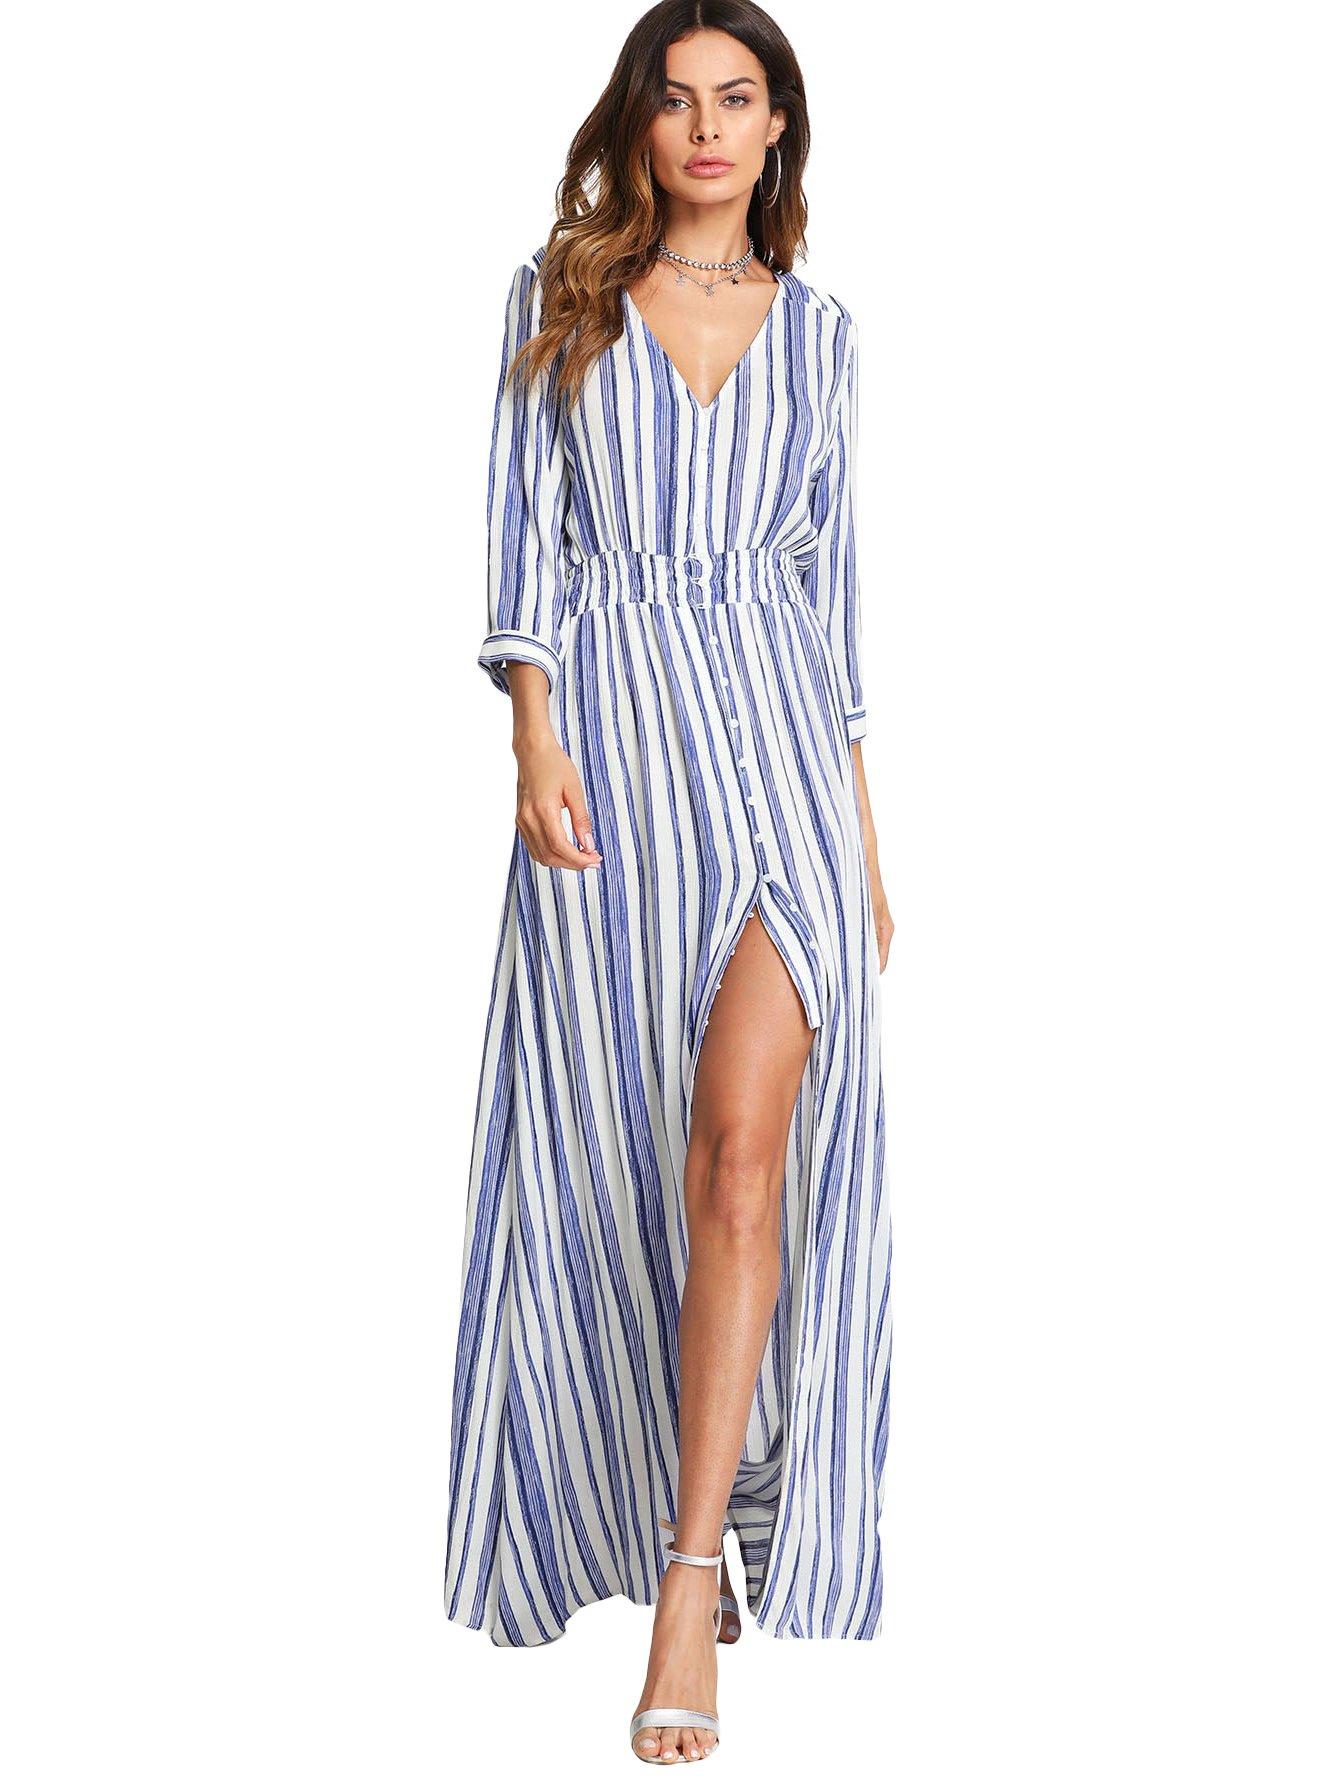 Milumia High Split Dress Women, Quarter Sleeves Lightweight Stripe Stylish Blue White L